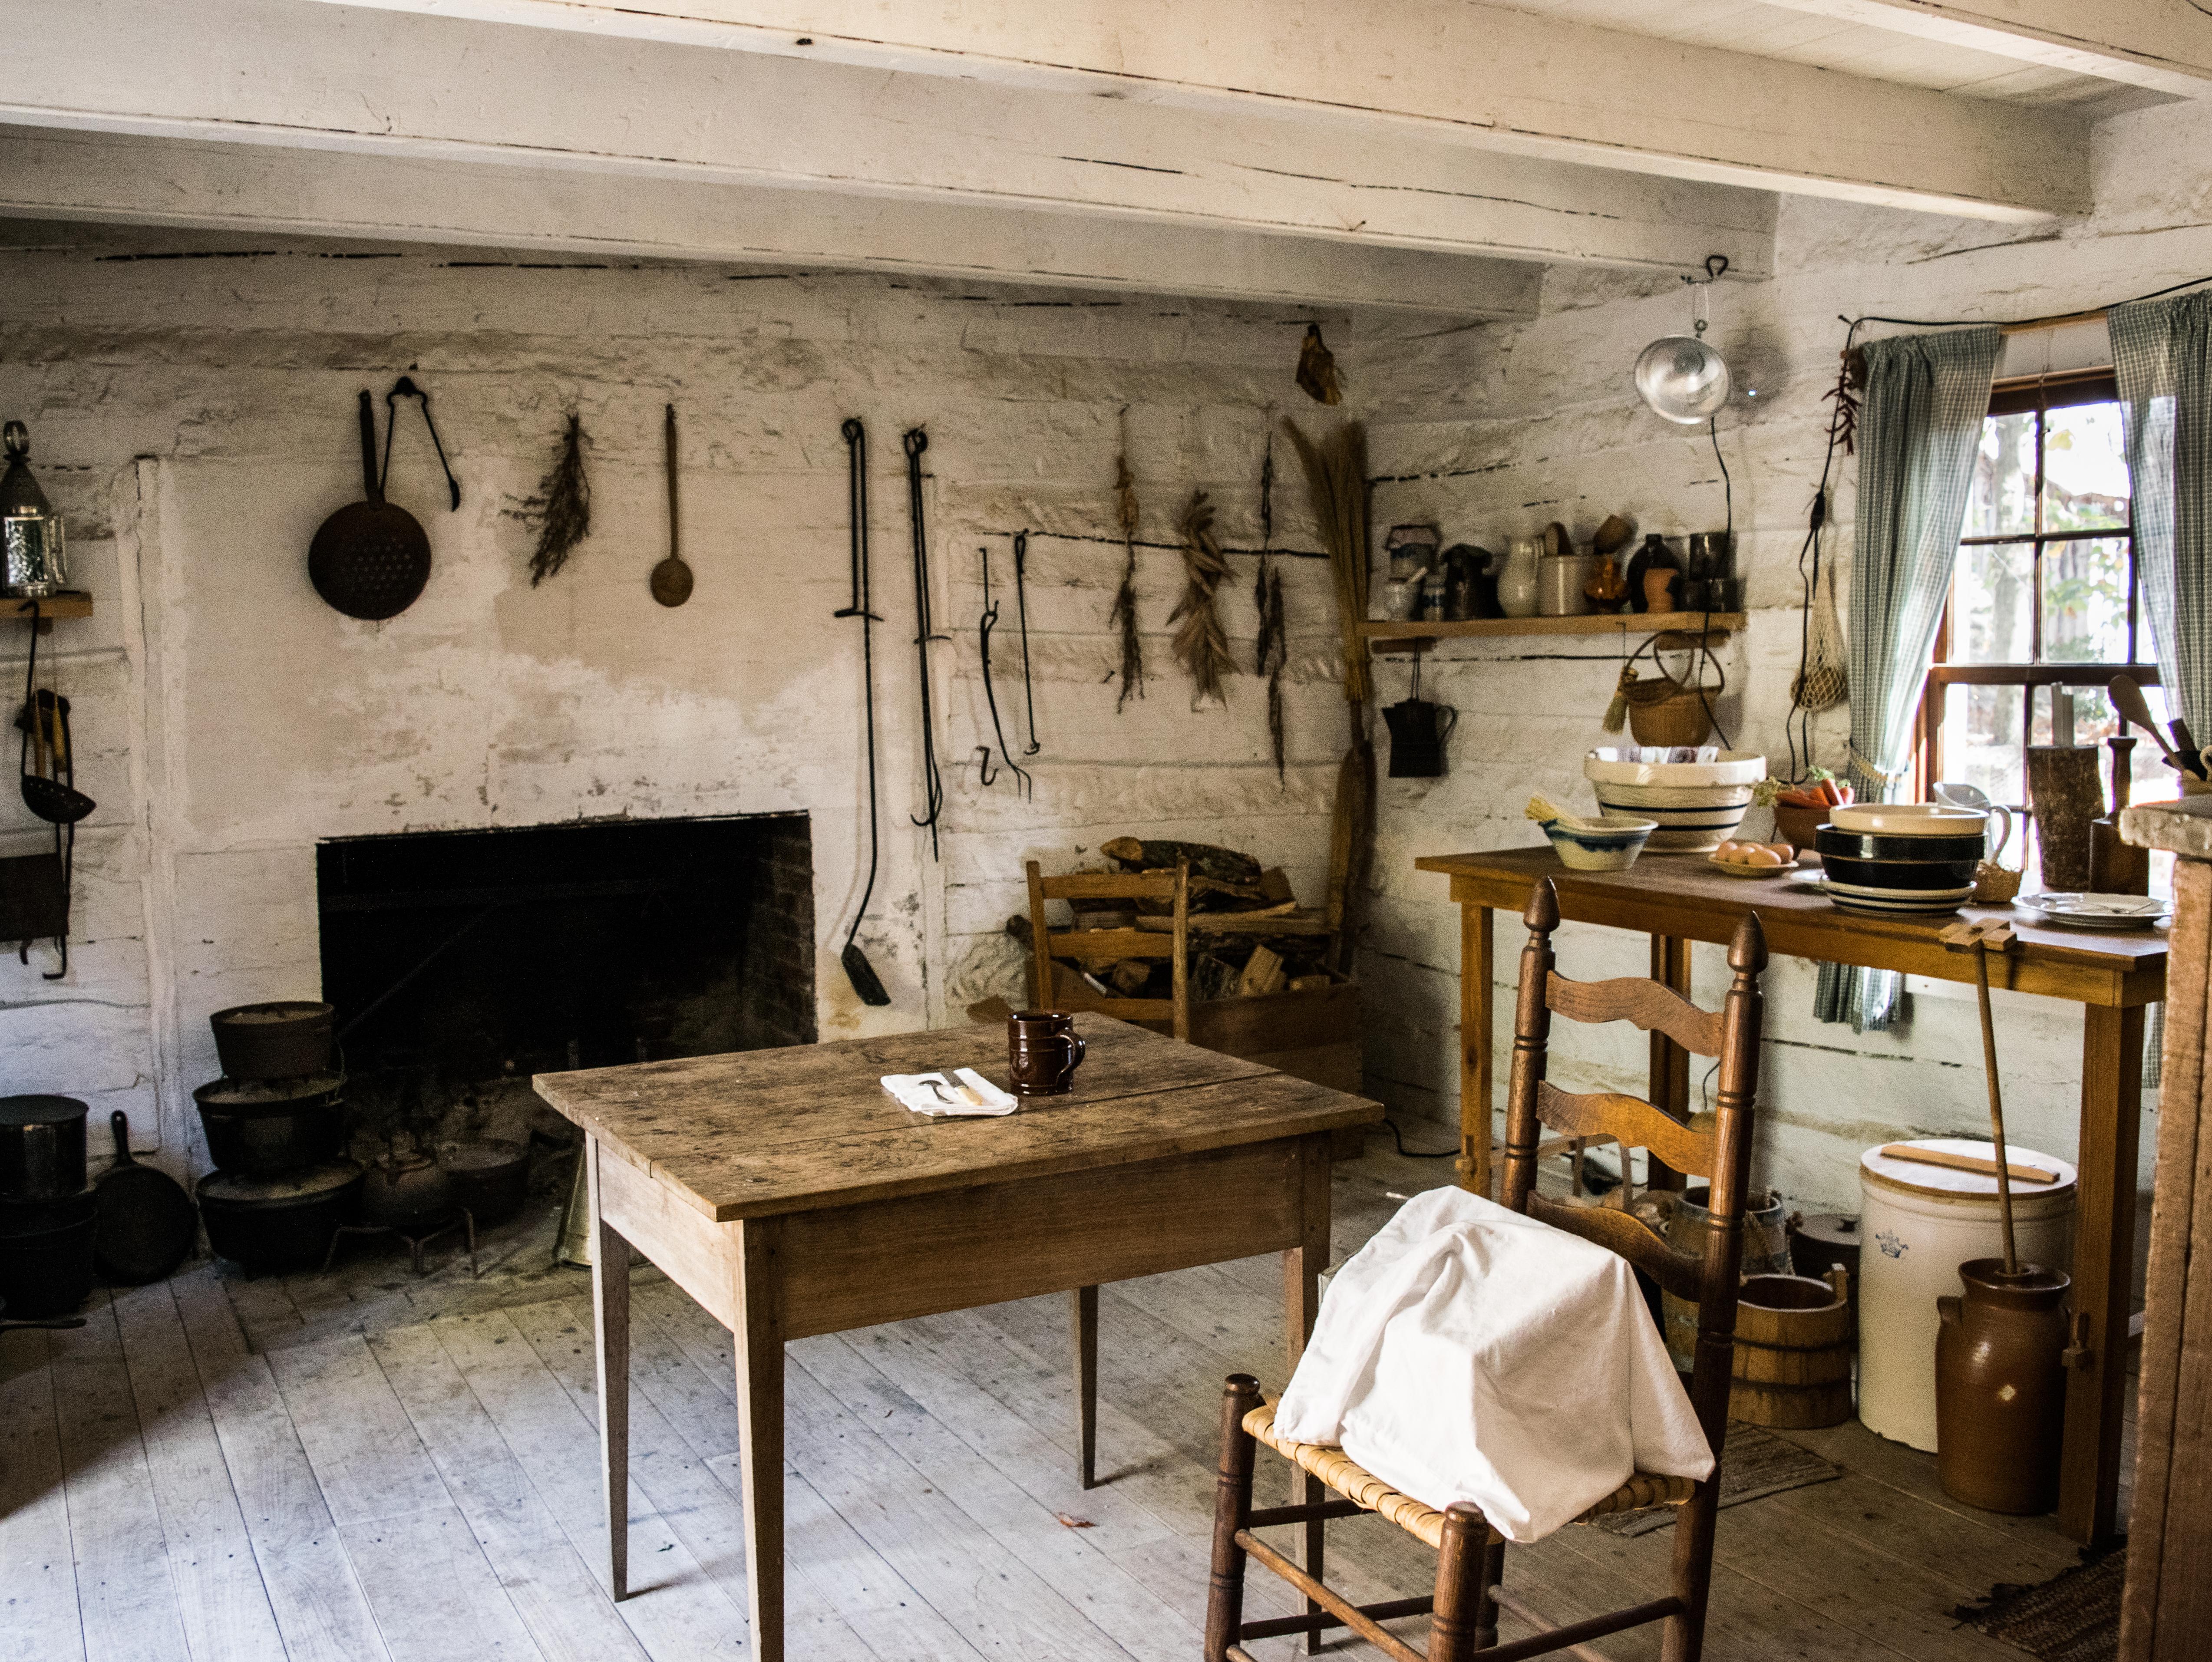 Interior of a Historic Cabin Burritt on the Mountain